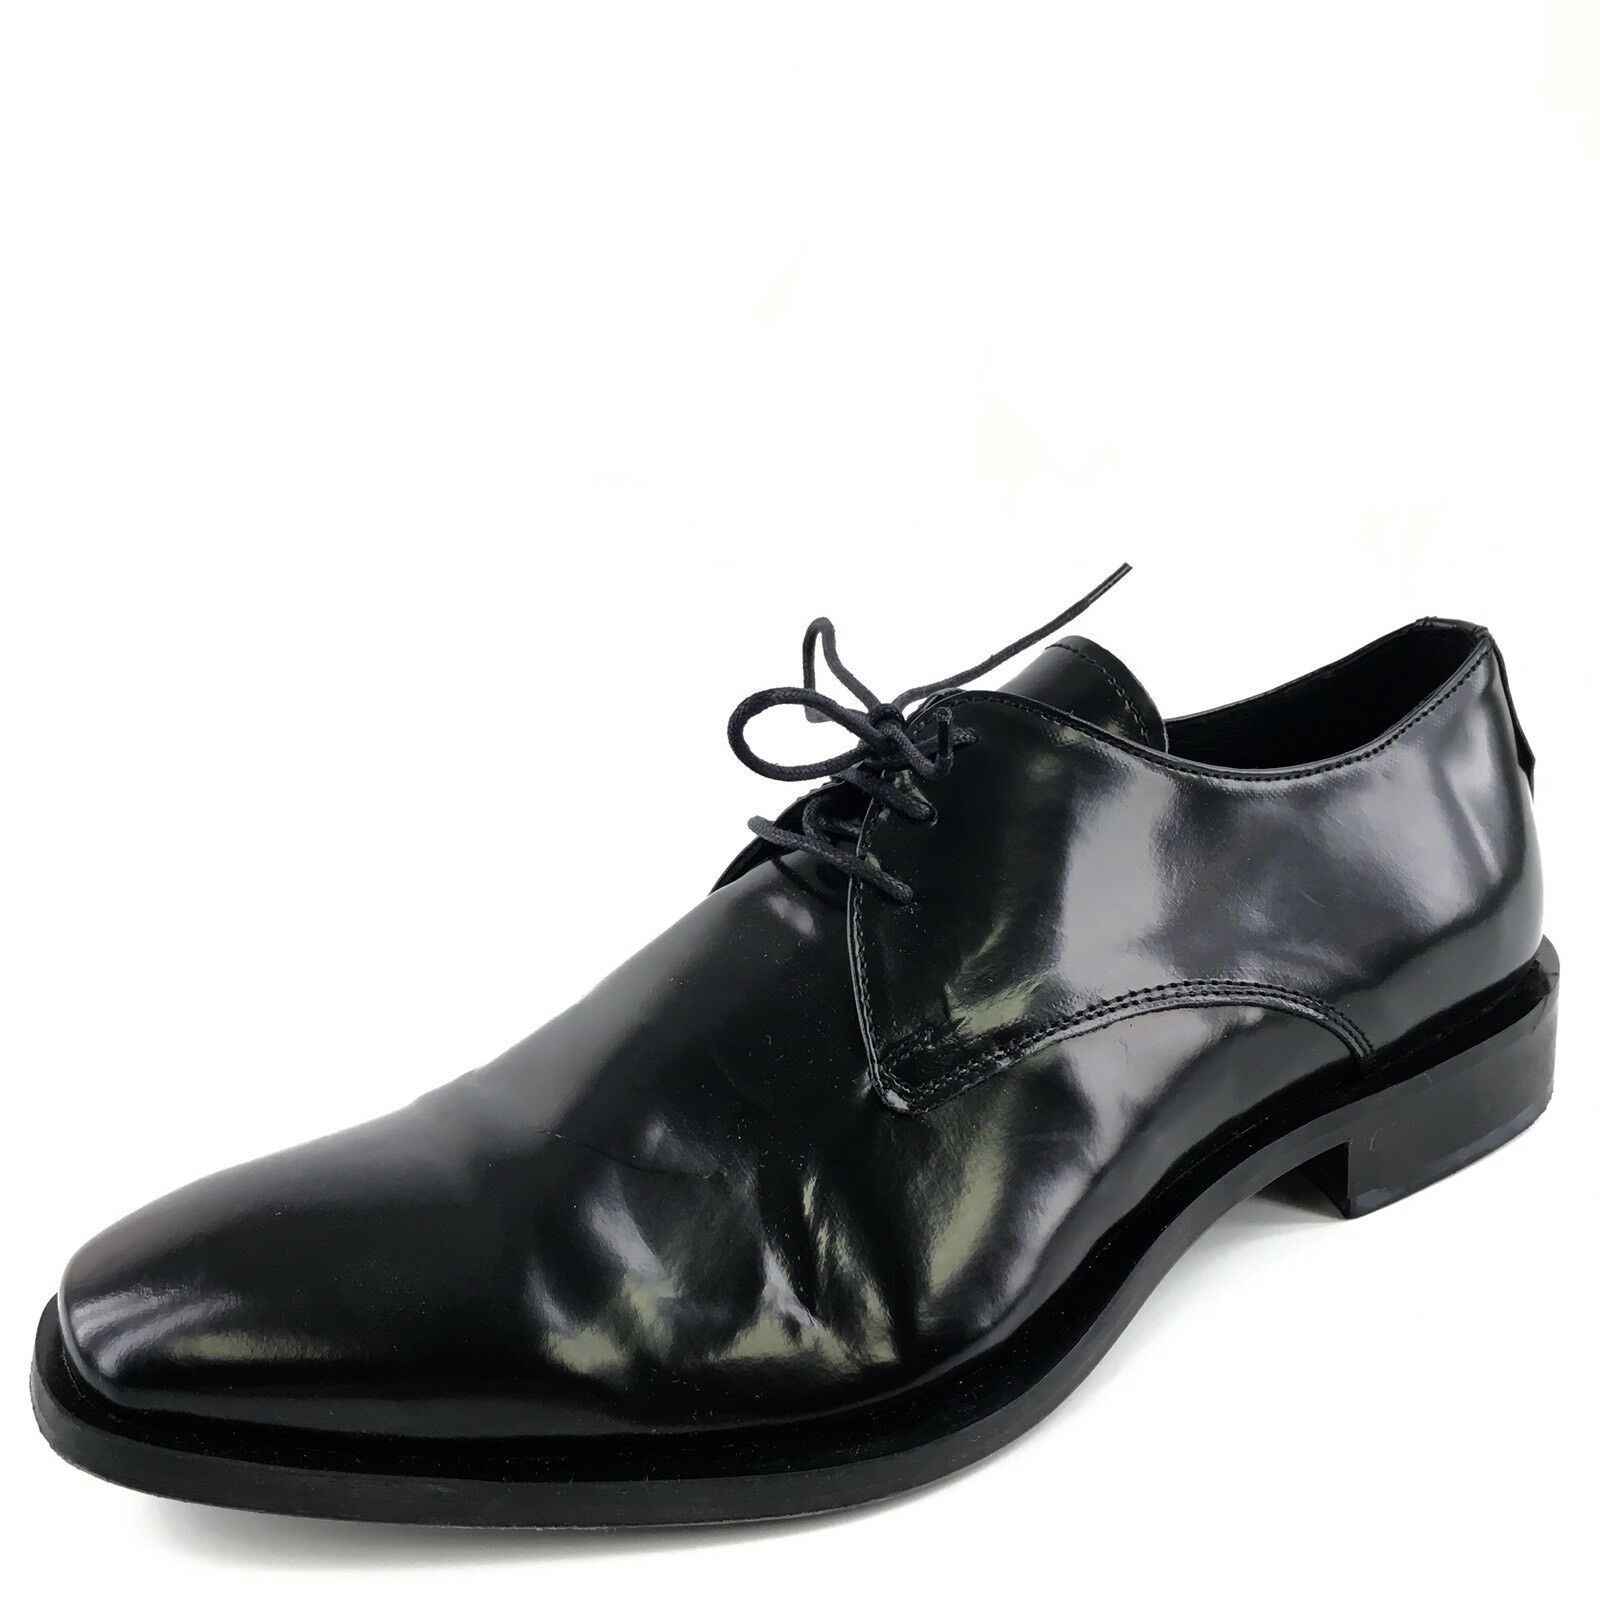 Kenneth Cole Gen-eration Black Leather Formal Oxfords shoes Men's Size 8.5 M